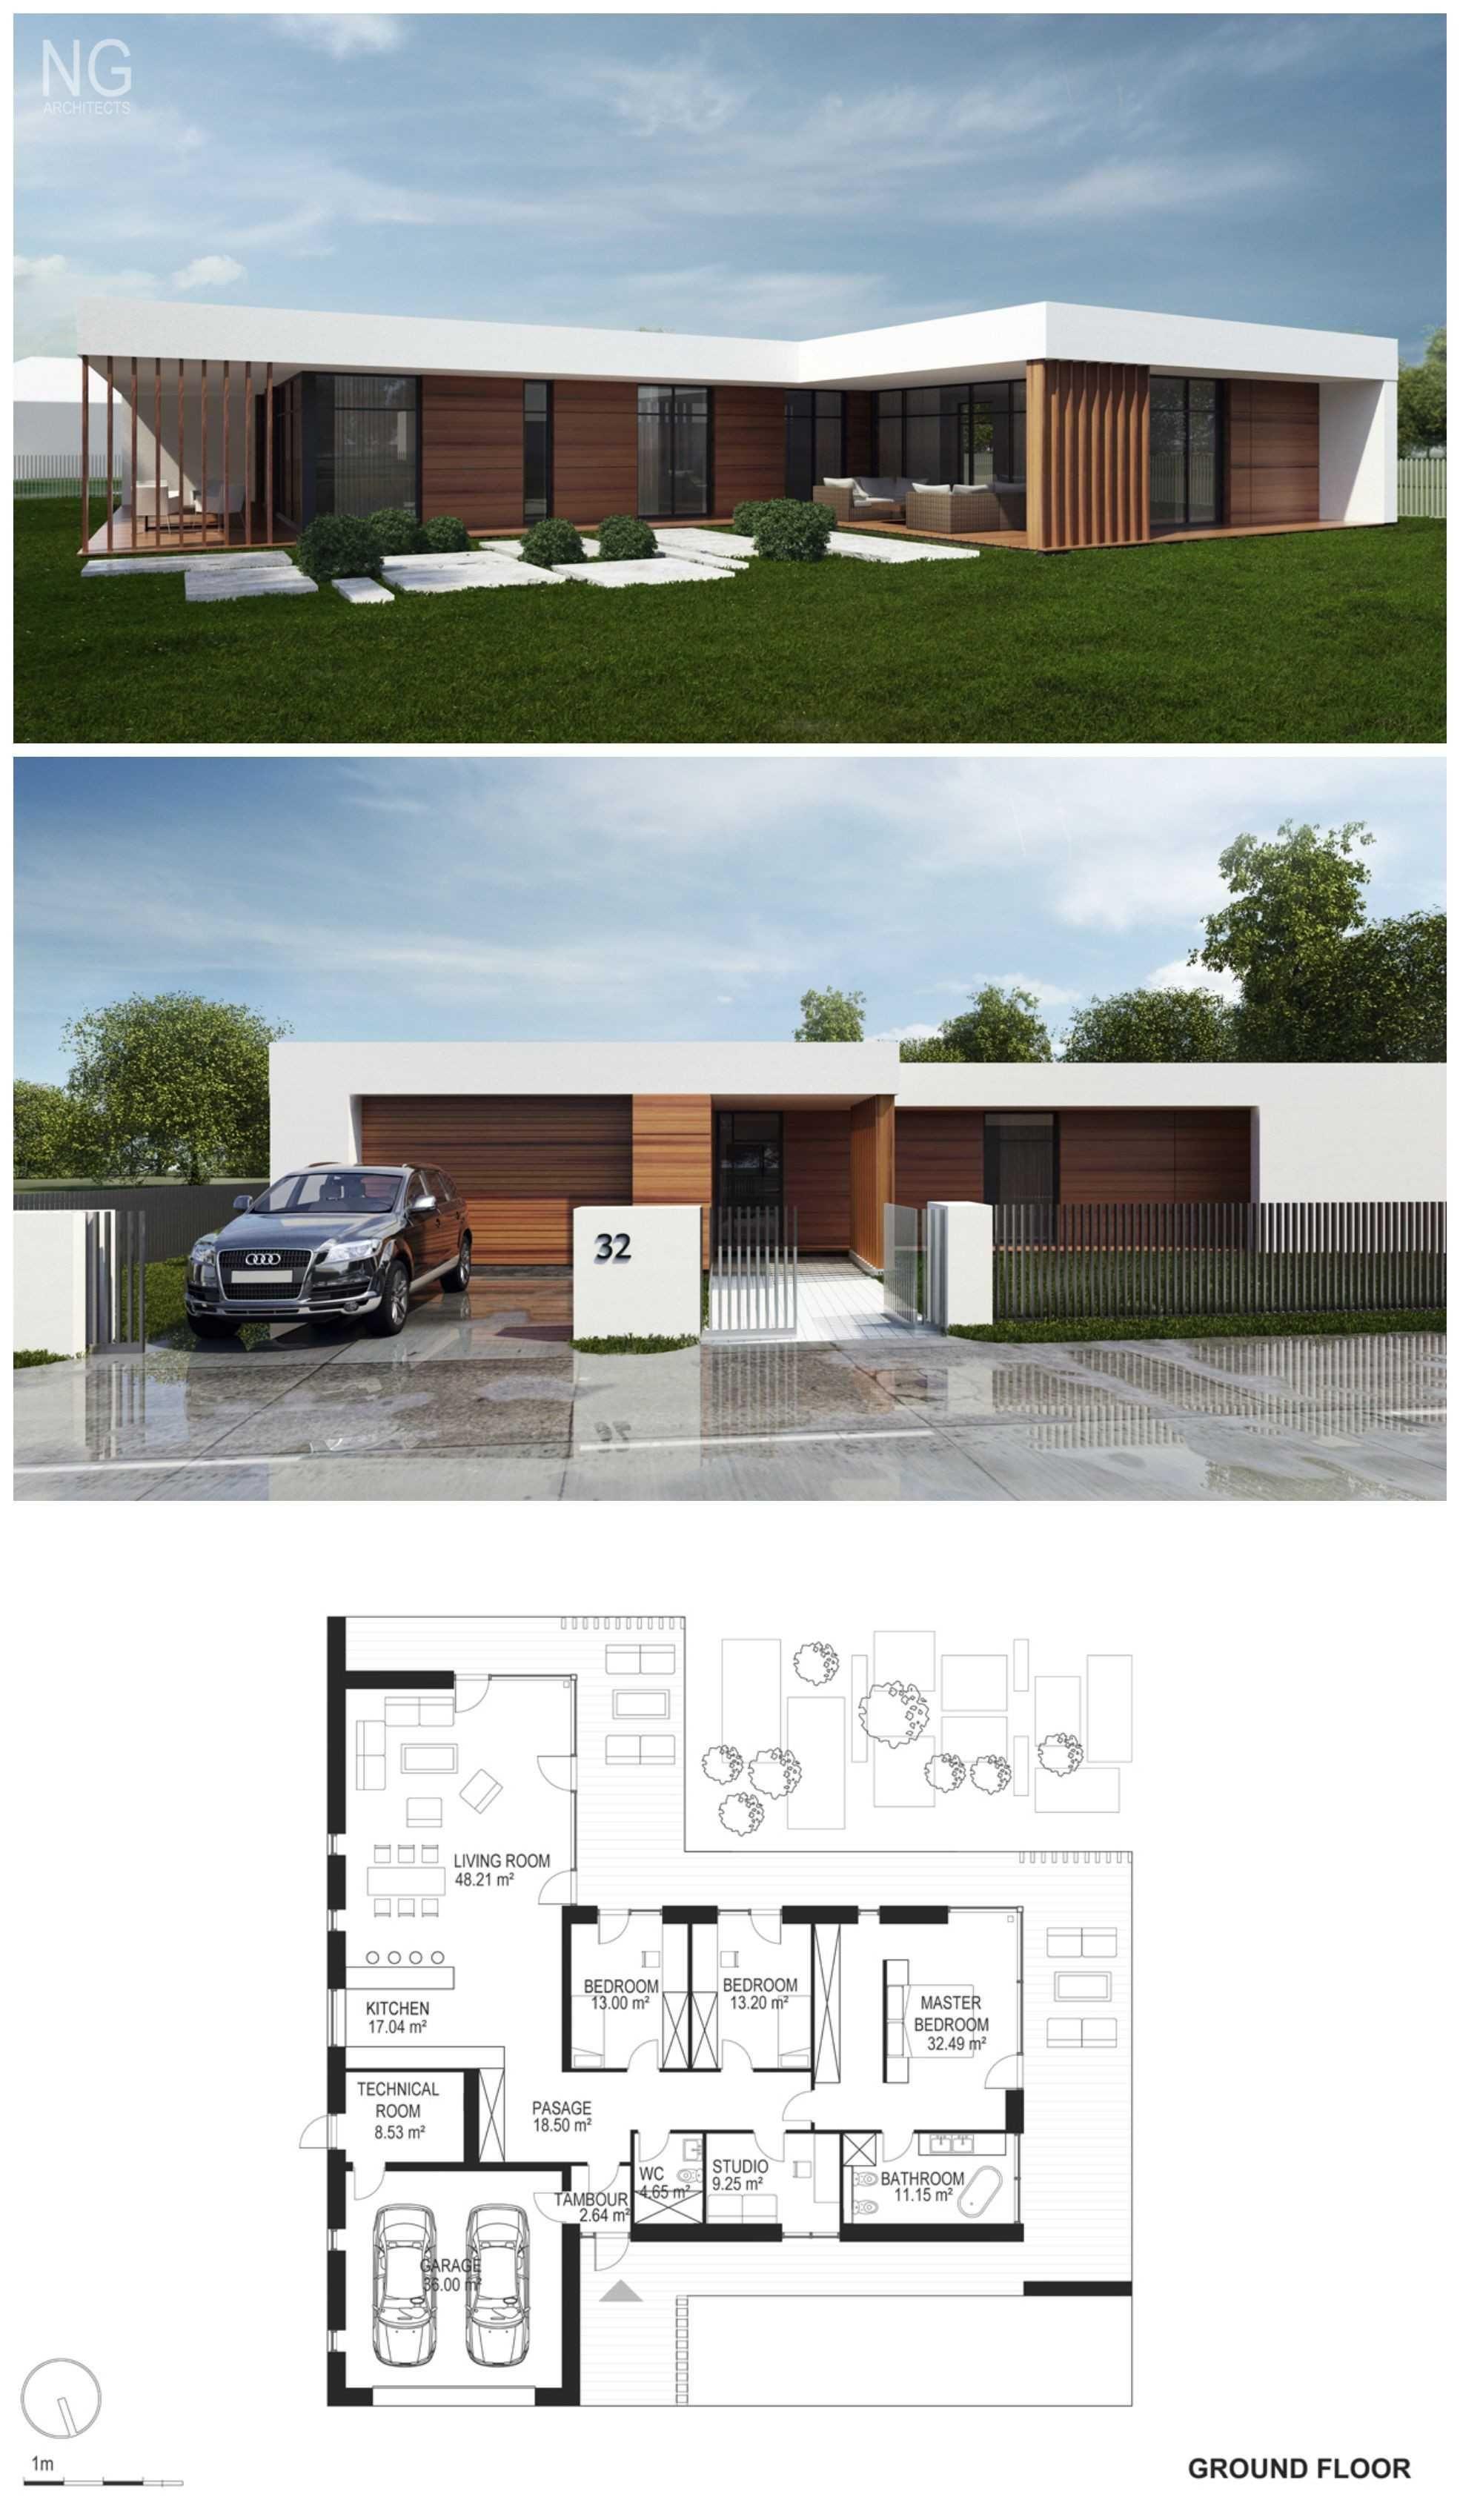 Farmhouse bungalow design fresh luxury   trendxyz also reinventing the glass box house casa hofmann in valencia jaw rh pinterest